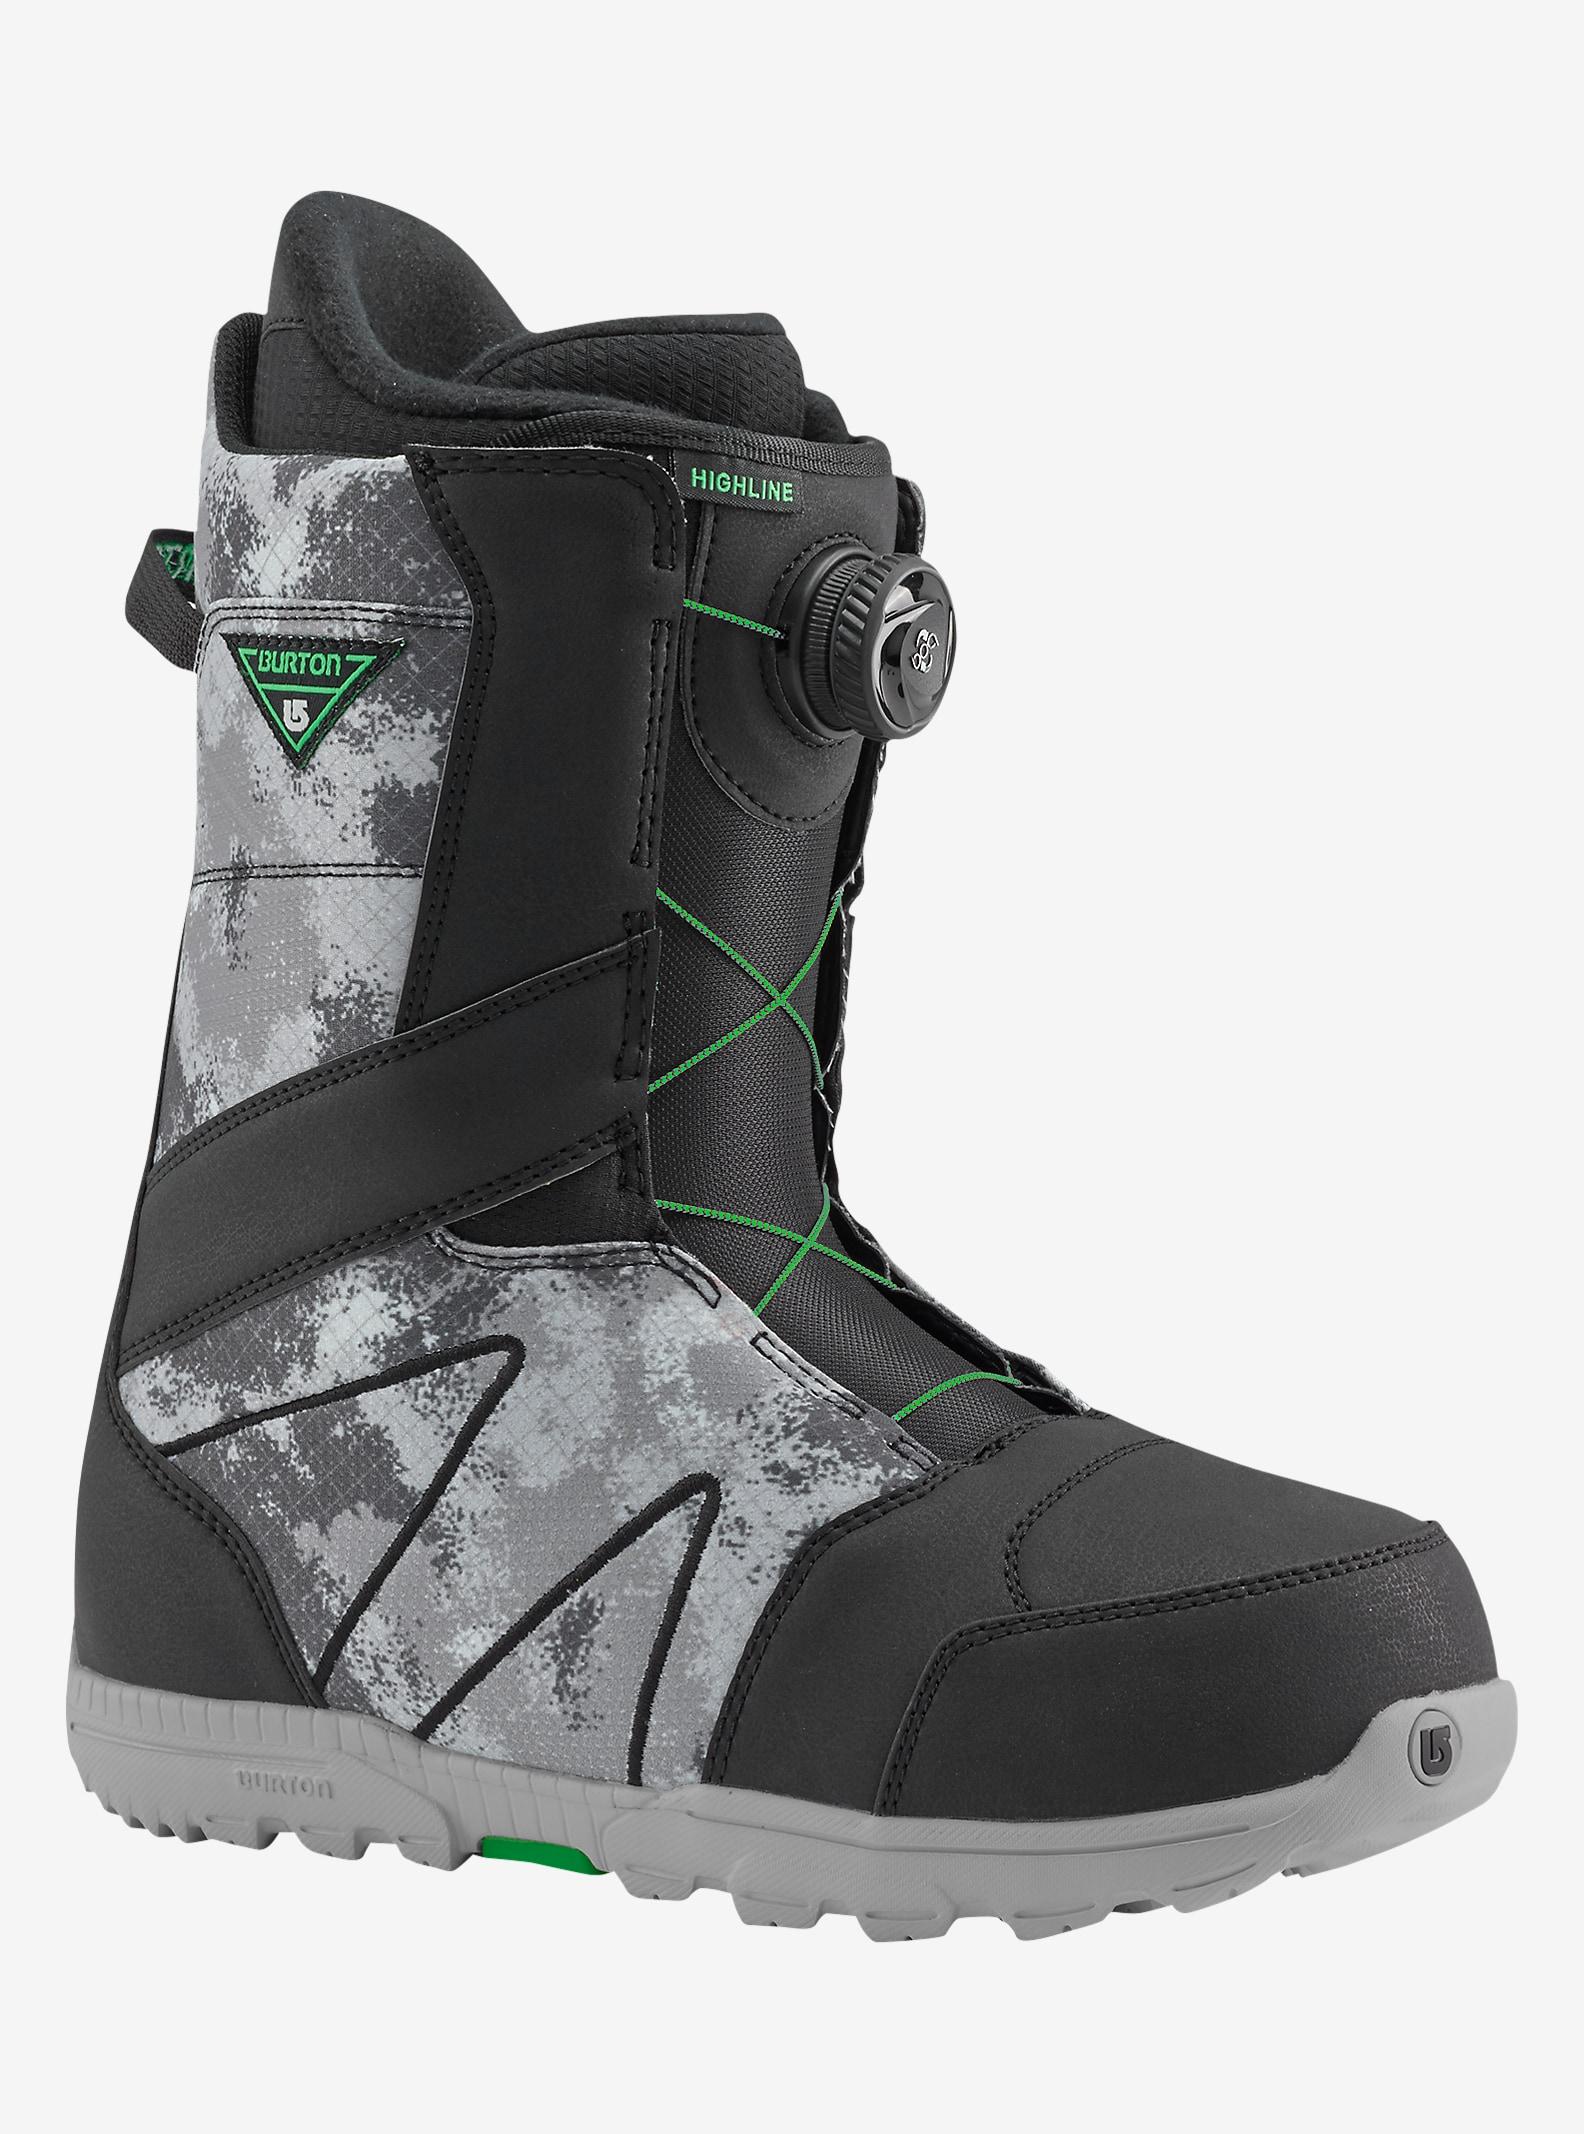 Burton Highline Boa® Snowboard Boot shown in Black / Gray